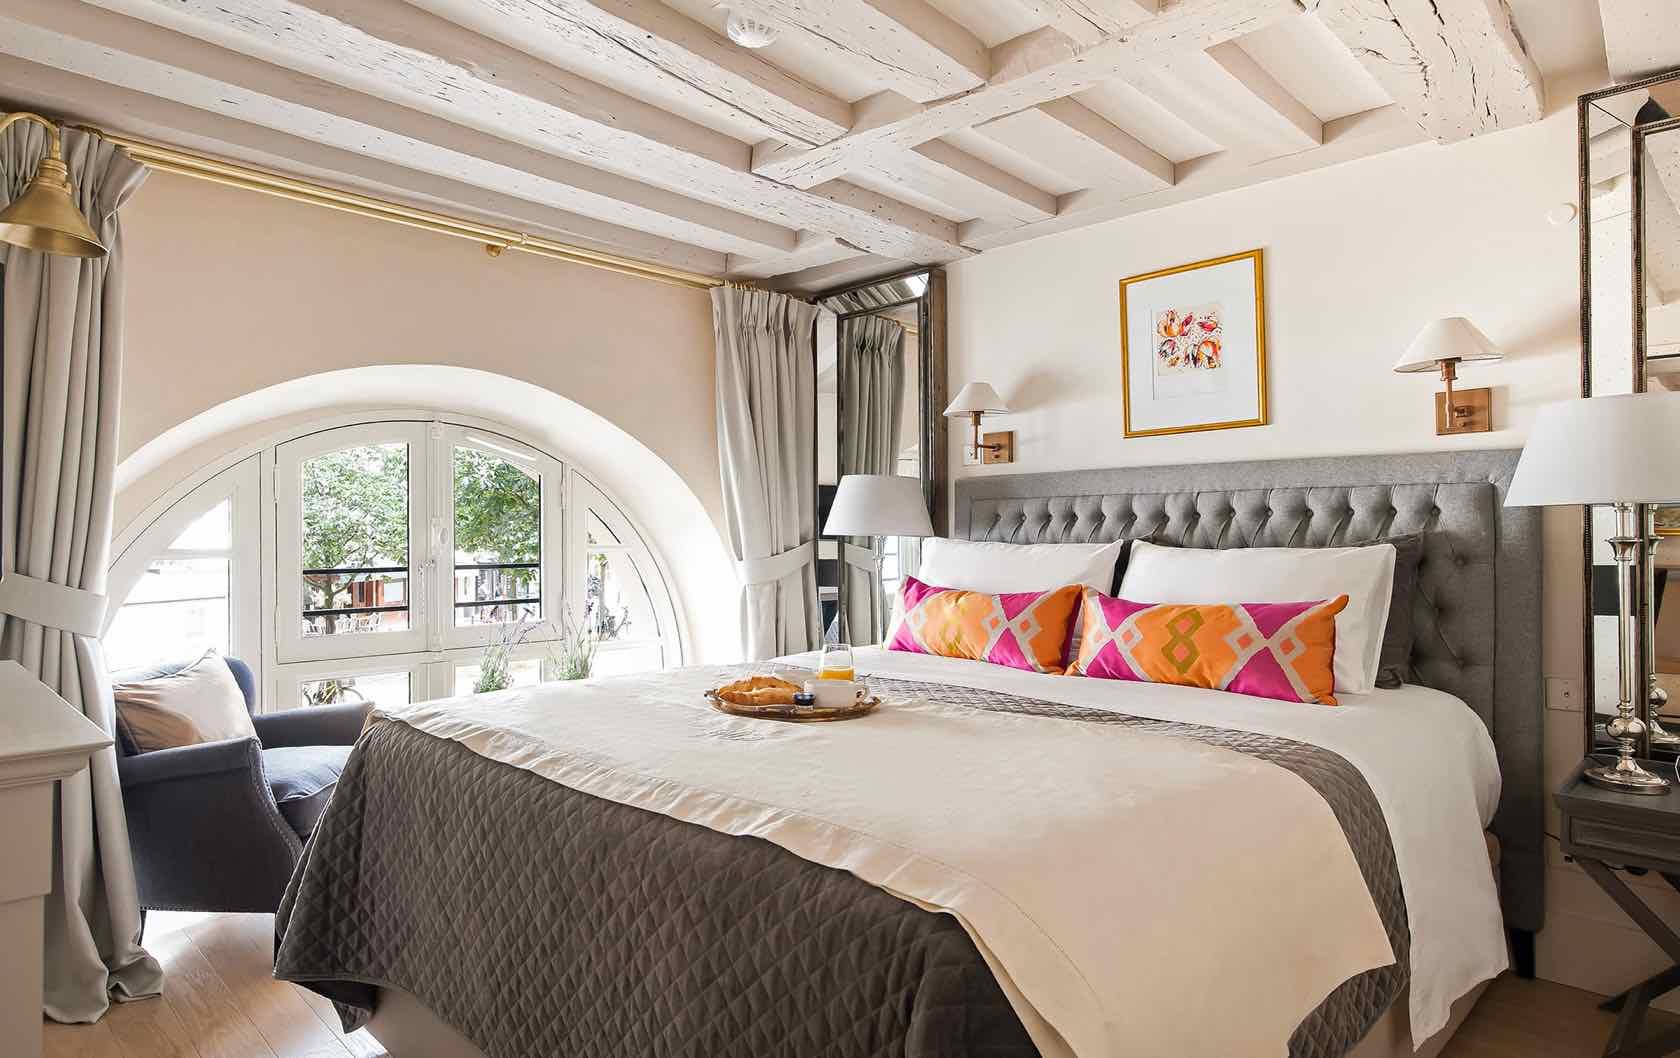 Paris into your home Place Dauphine apartment